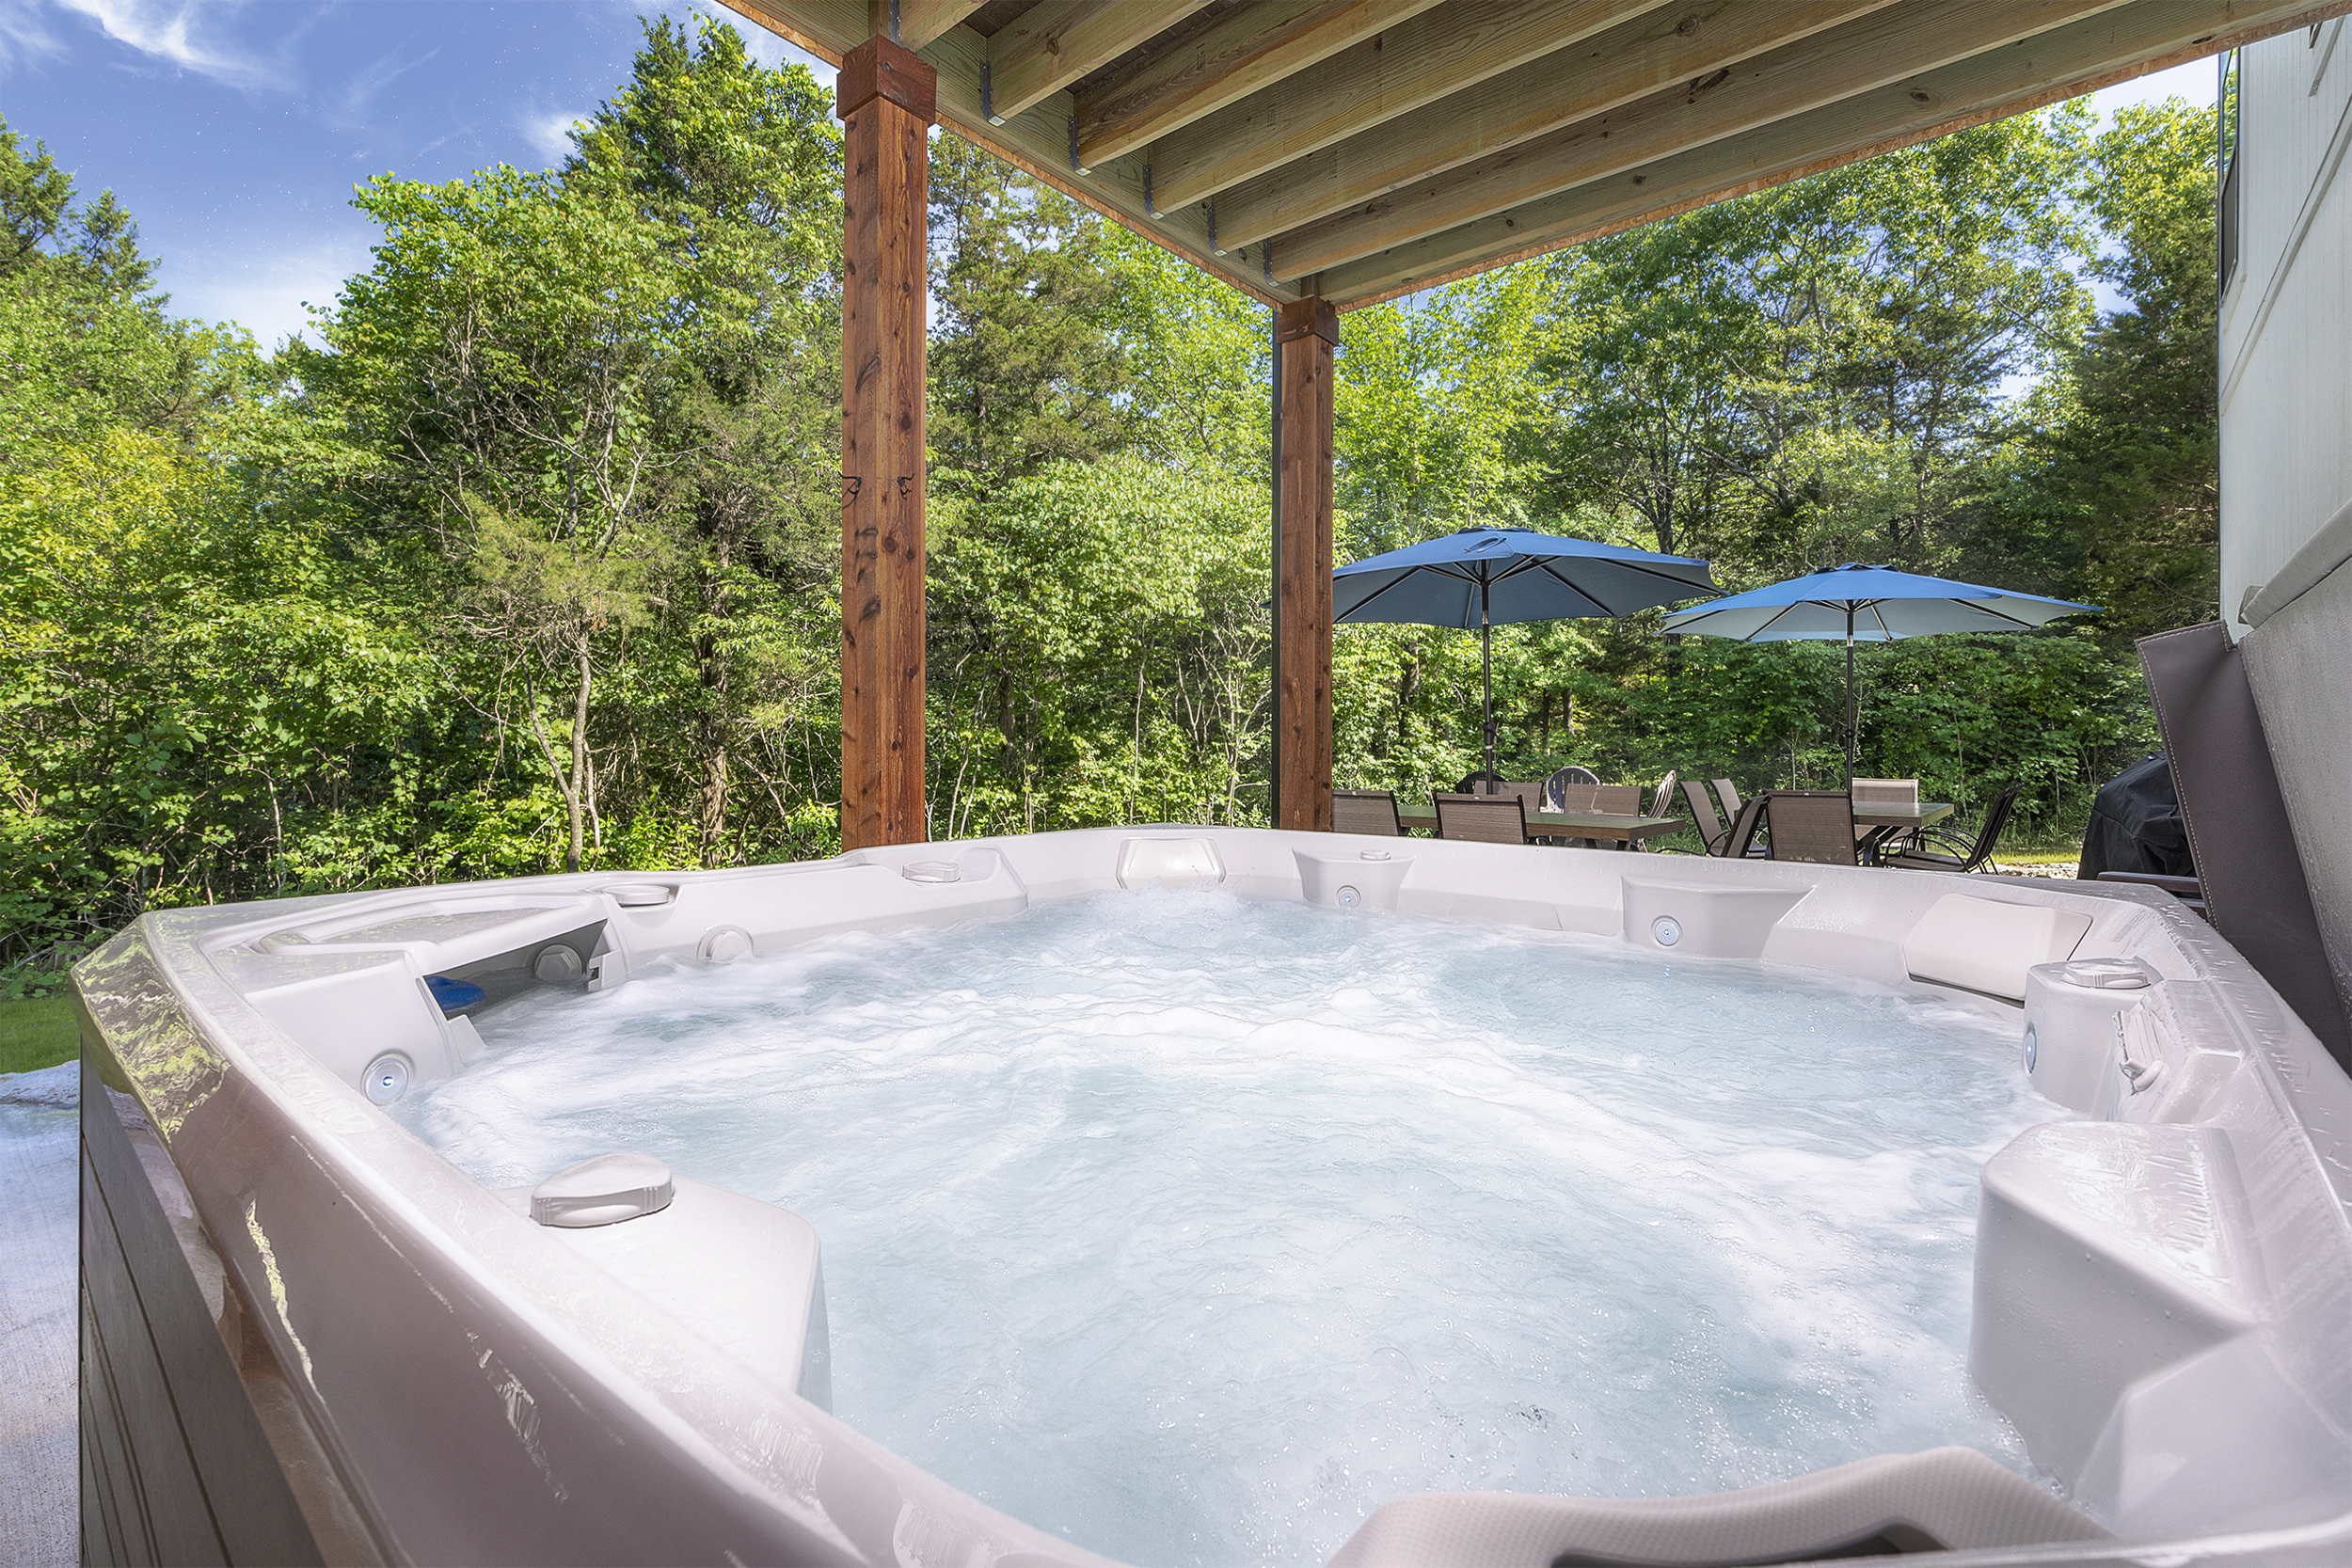 7 person hot tub